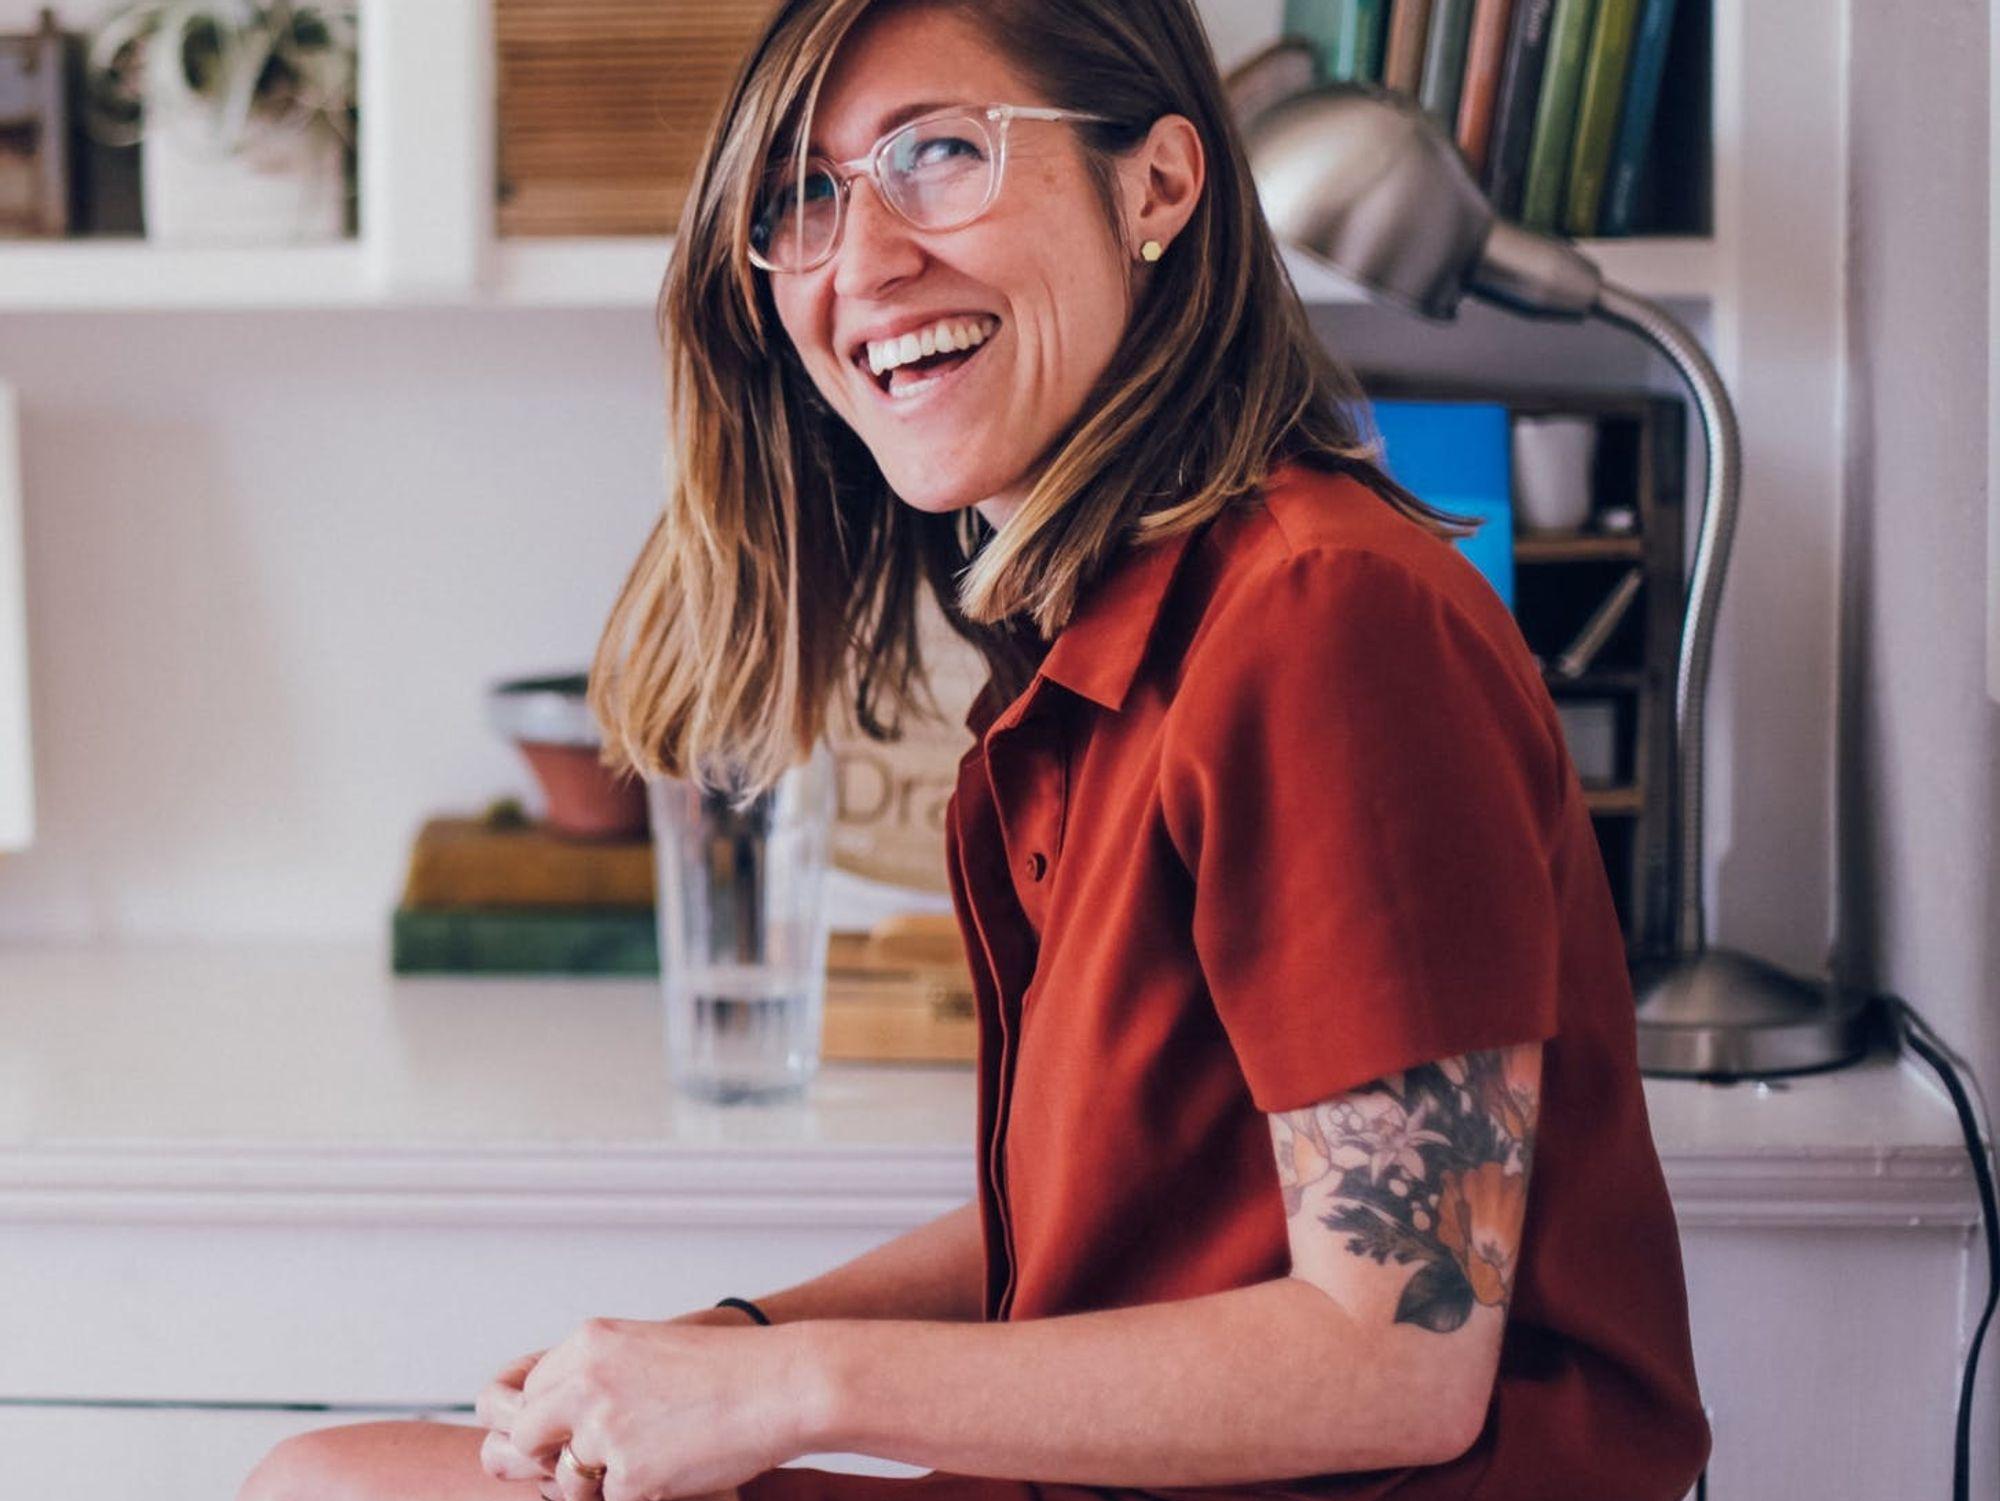 Creative Crushin': Katrina McHugh, the Designer Who Will Change the Way You Look at Pop Songs